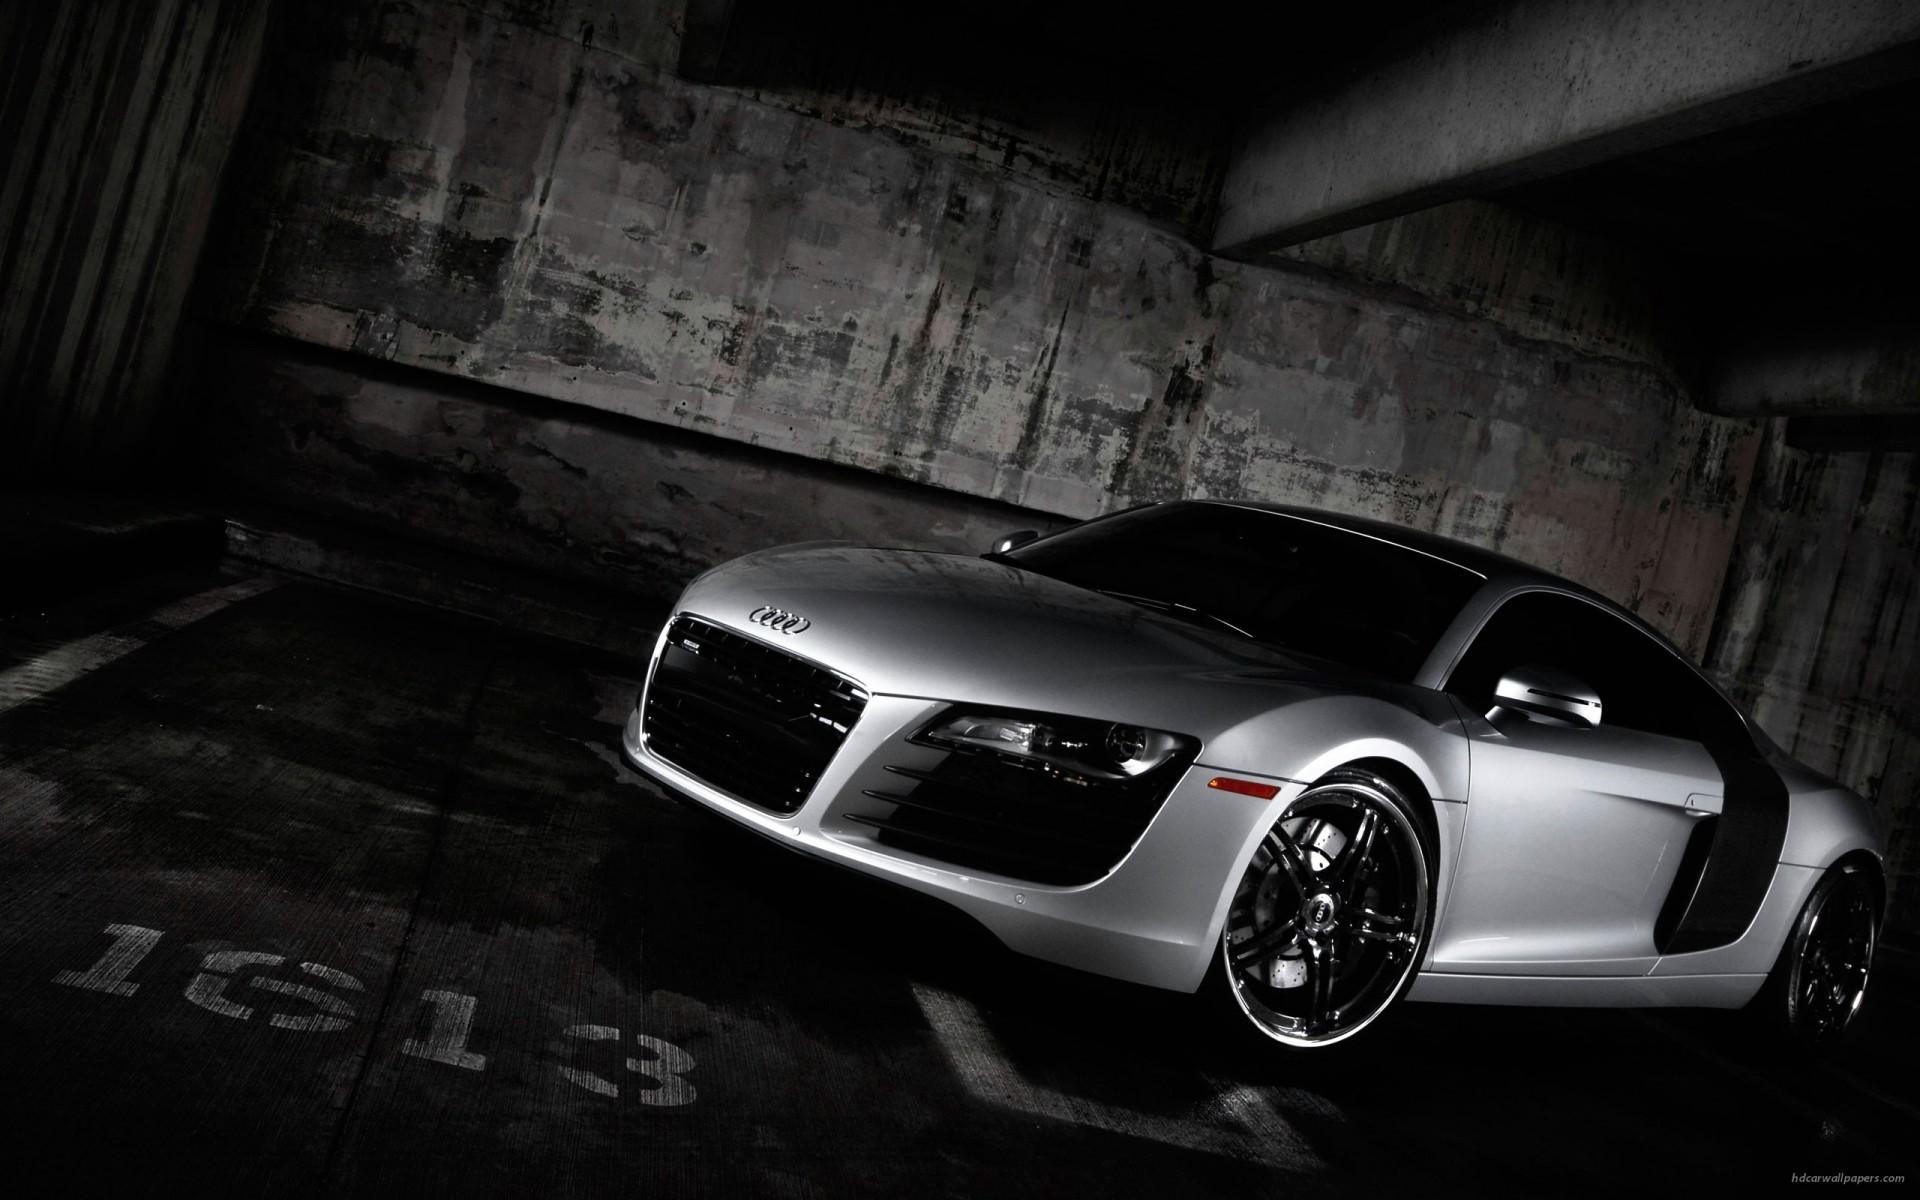 Audi R8 Hd Widescreen Wallpapers 1080p Audi R8 Hd Widescreen Wallpapers Hd Wallpapers Id 4187